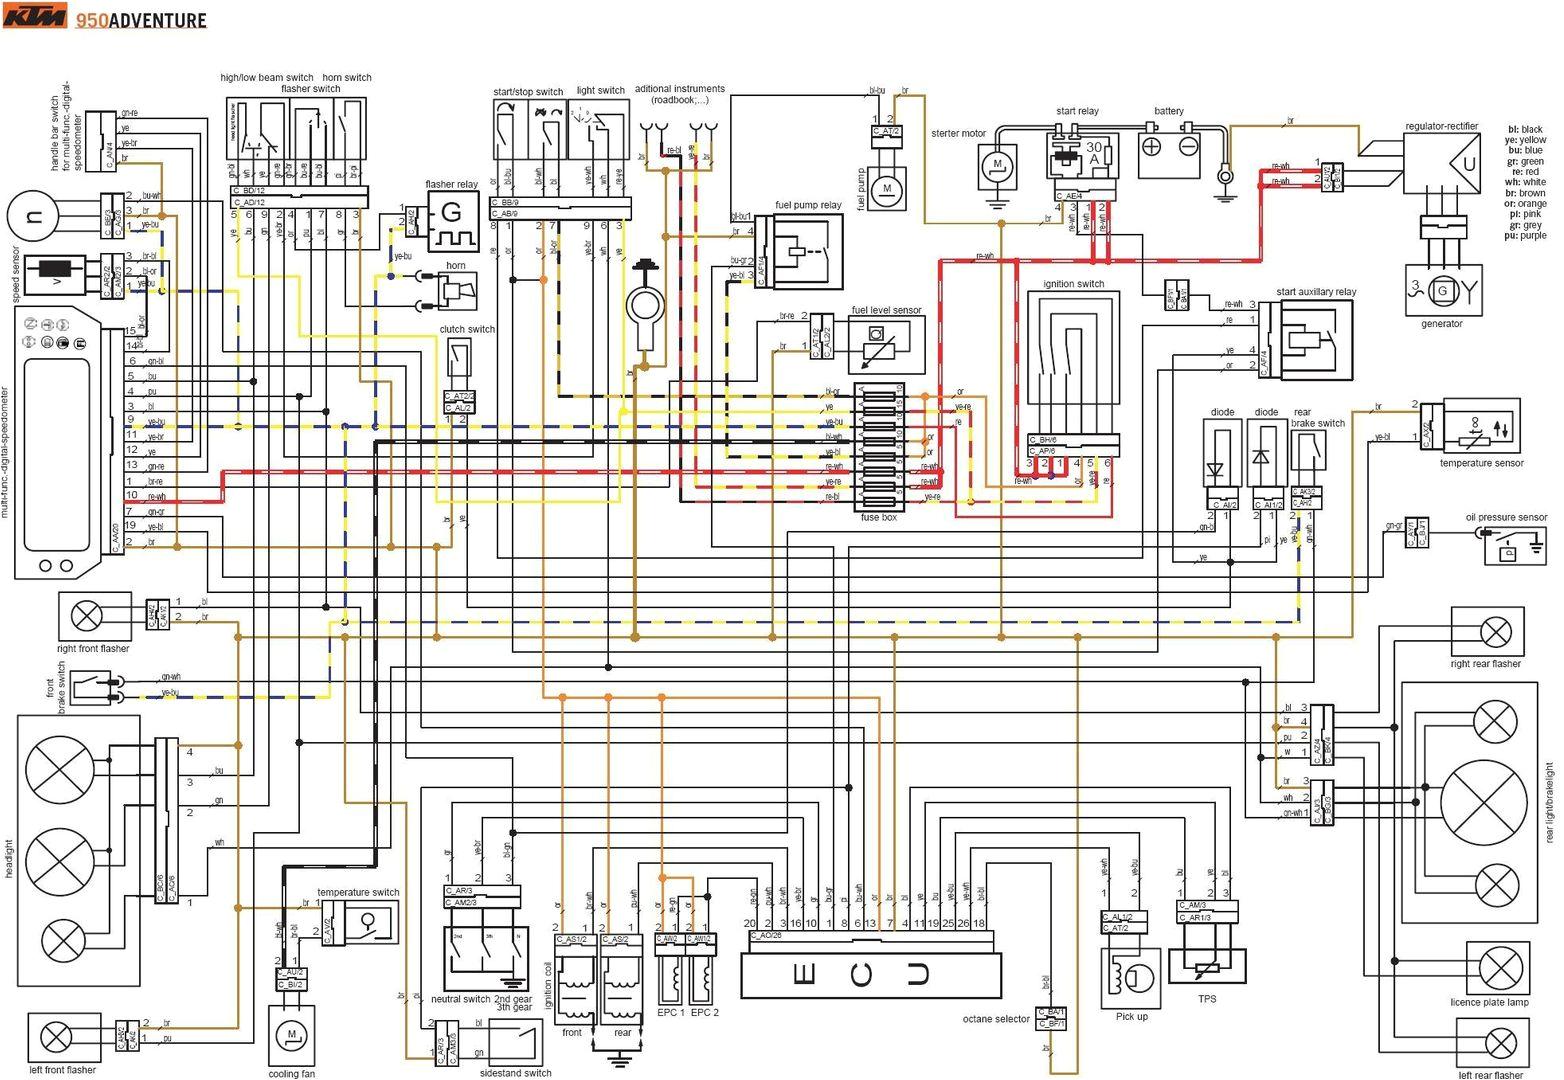 1994 ktm wiring diagram wiring diagram world 1994 ktm wiring diagram